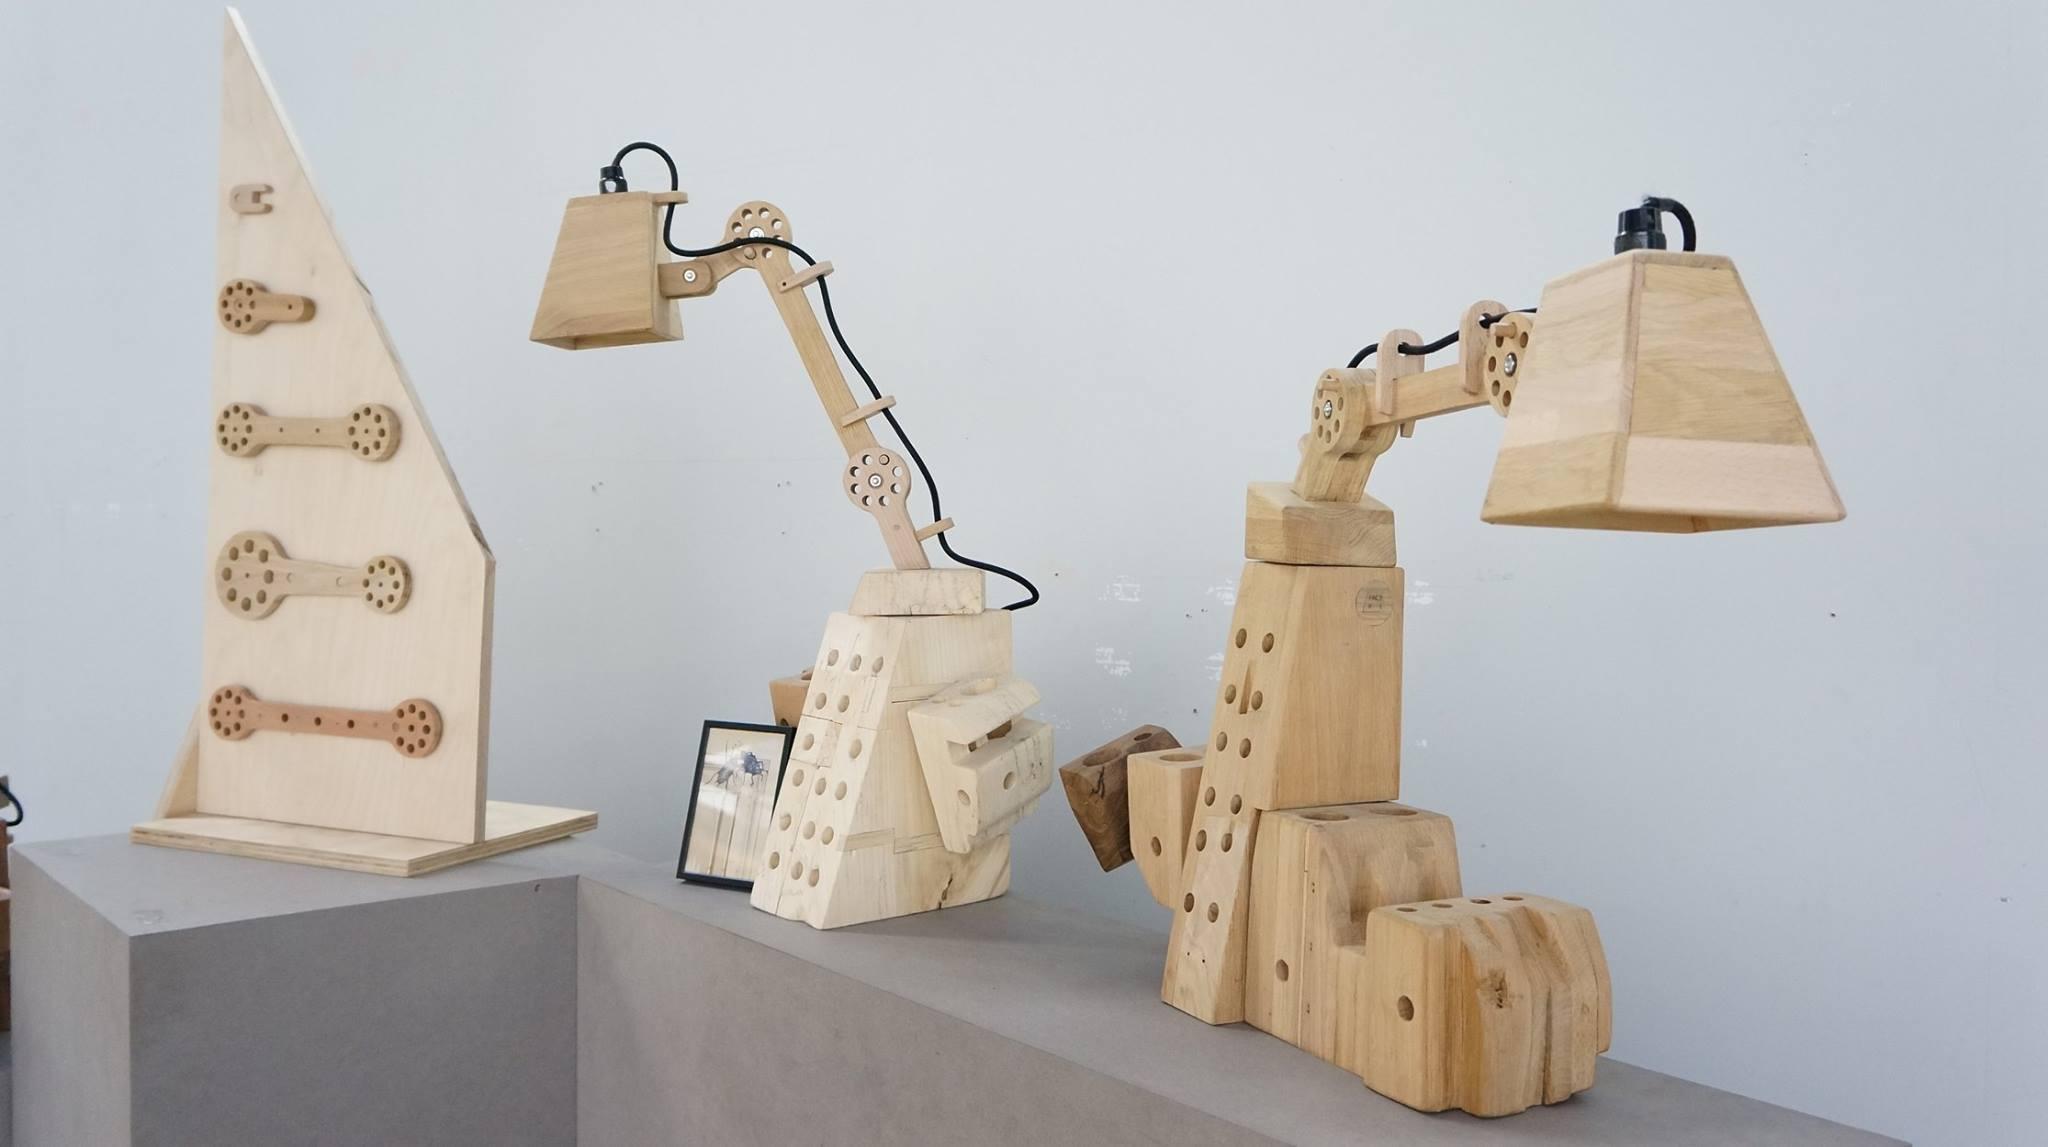 Mobilier design en bois - ICI Montreuil